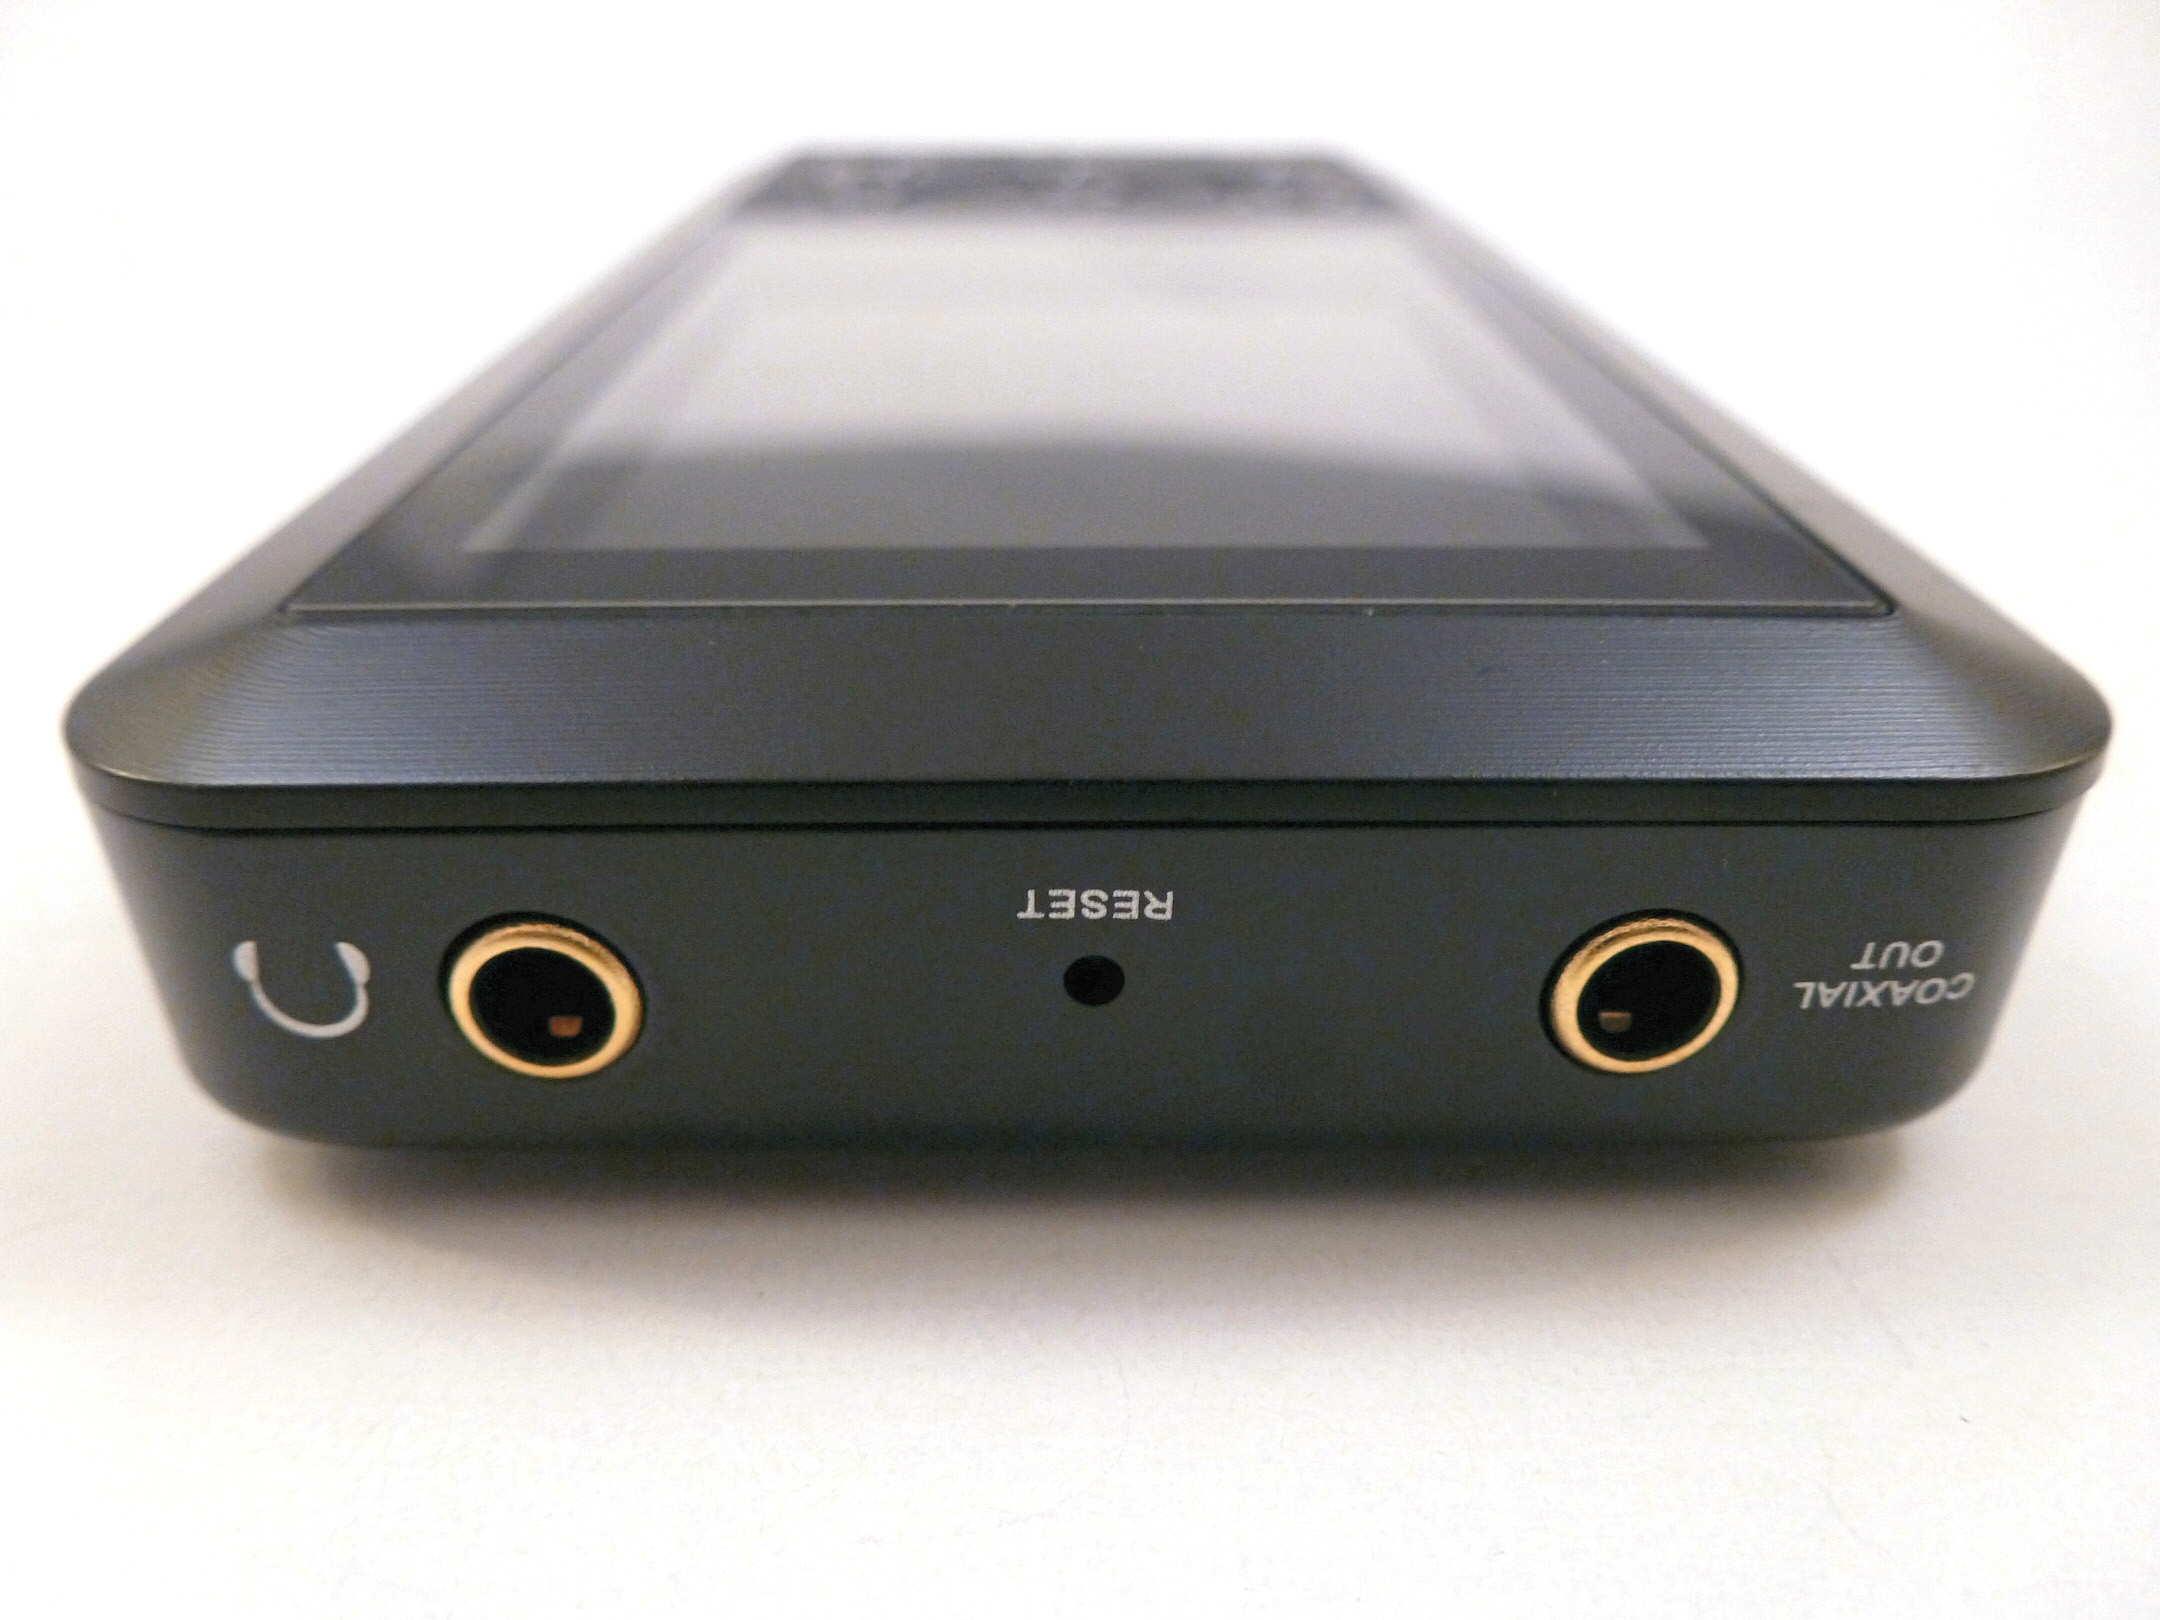 Fiio X3 24 bit/192K Digital Audio Player review   The